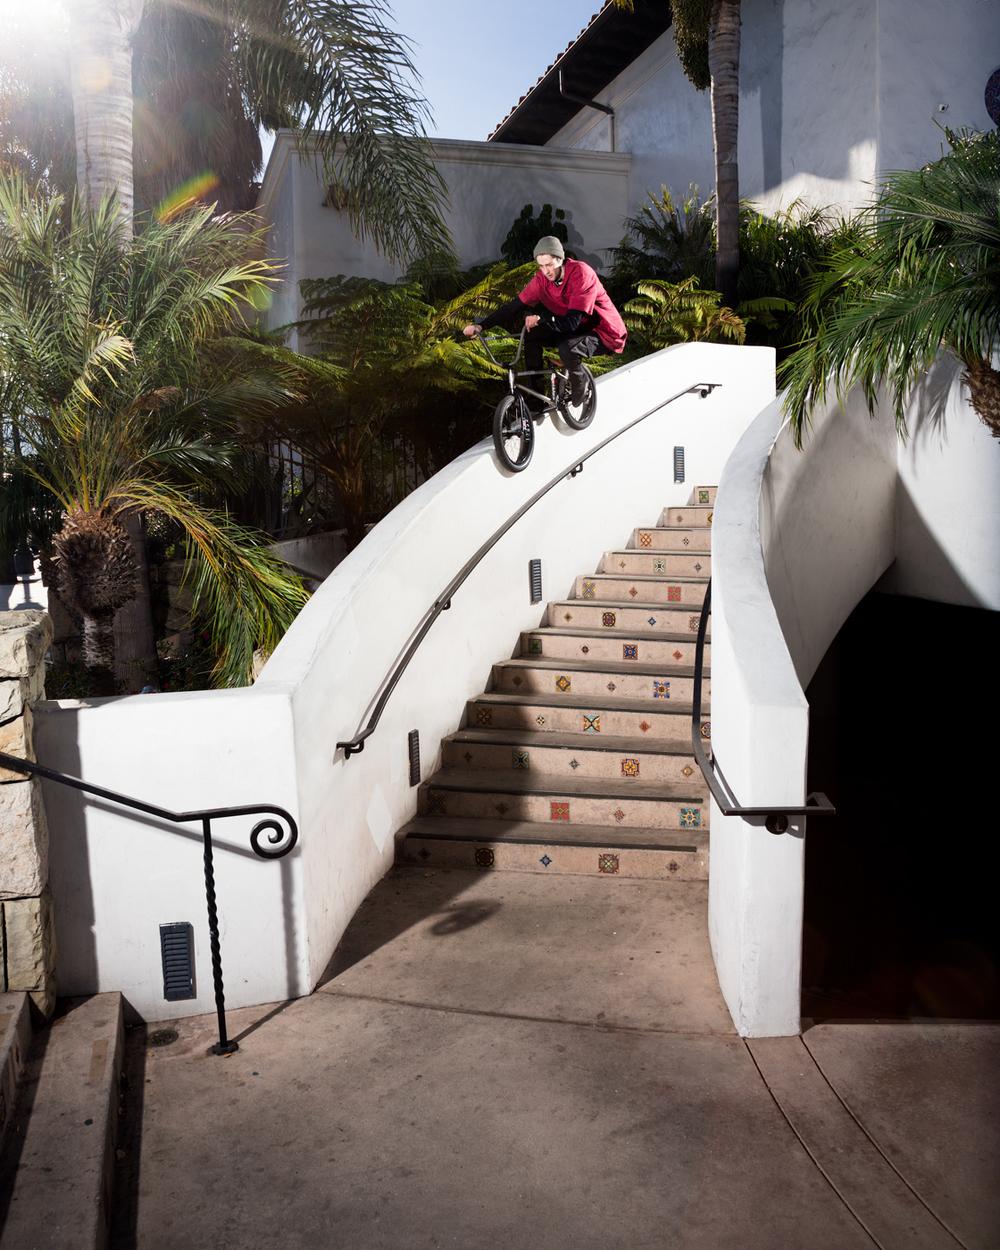 David Grant BMX Double Peg